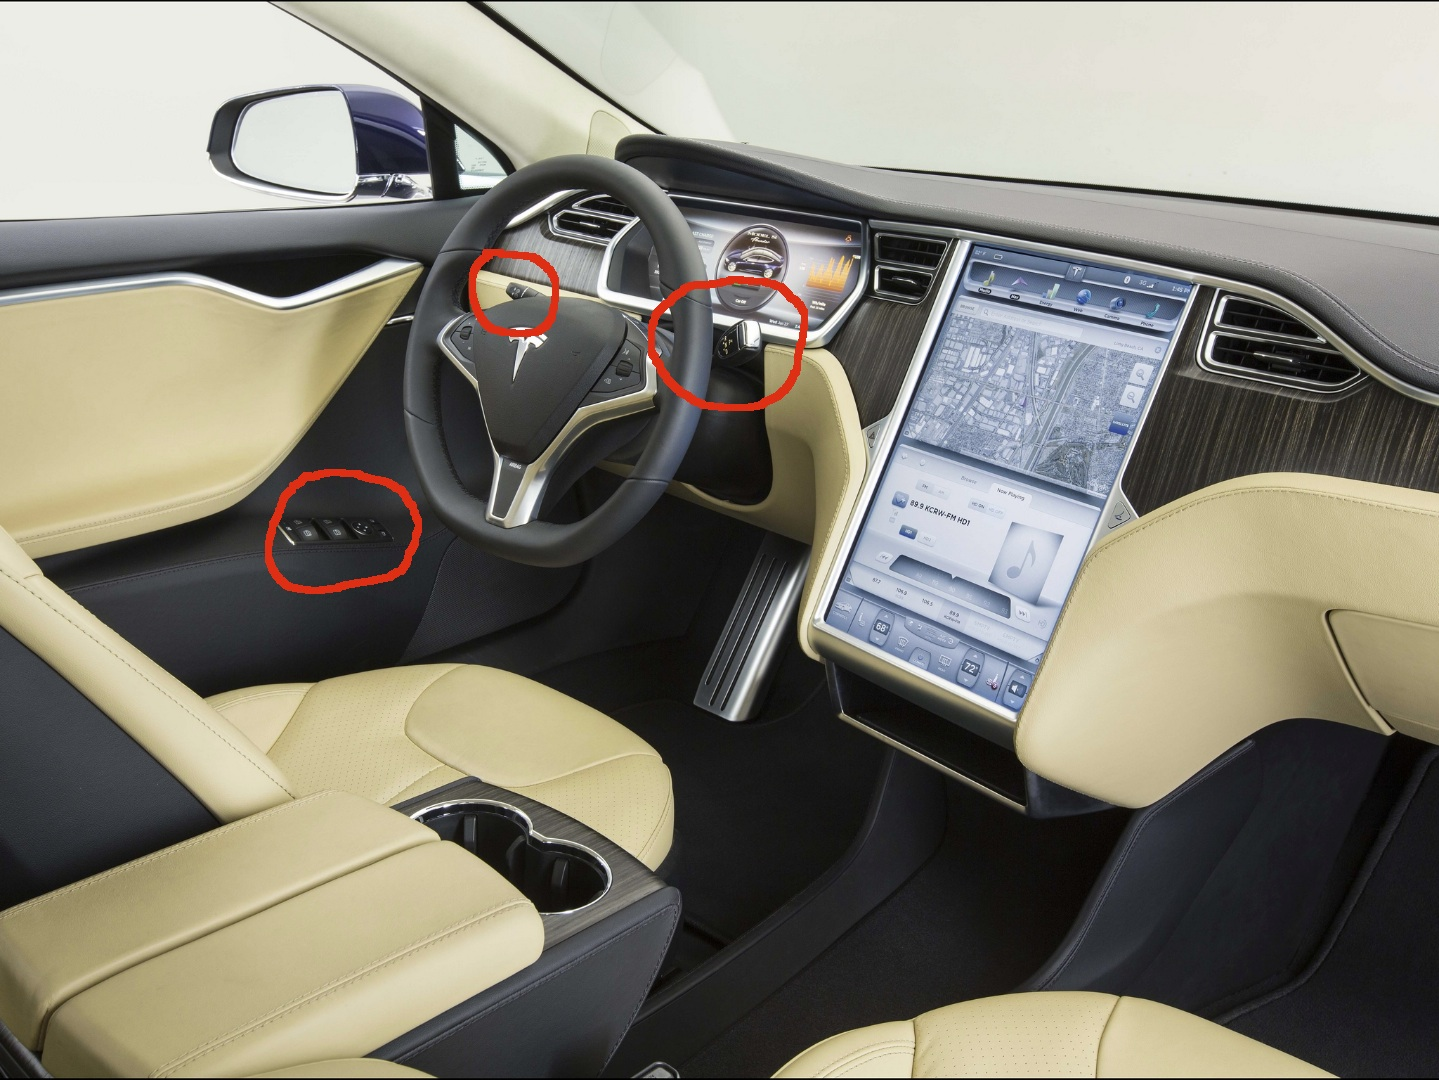 The Tesla Model S is Using Mercedes-Benz Switchgear ...